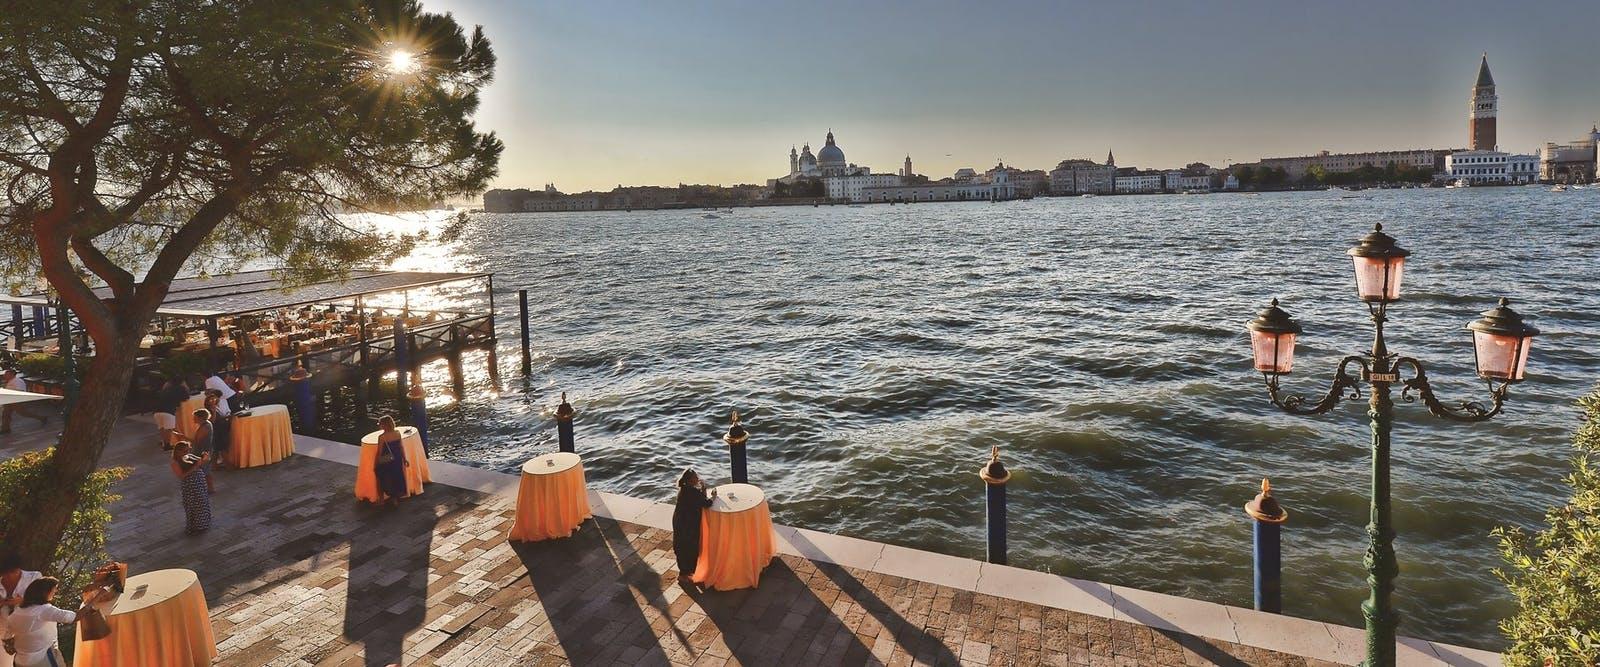 Belmond Hotel Cipriani Holidays - Luxury Venice Resort